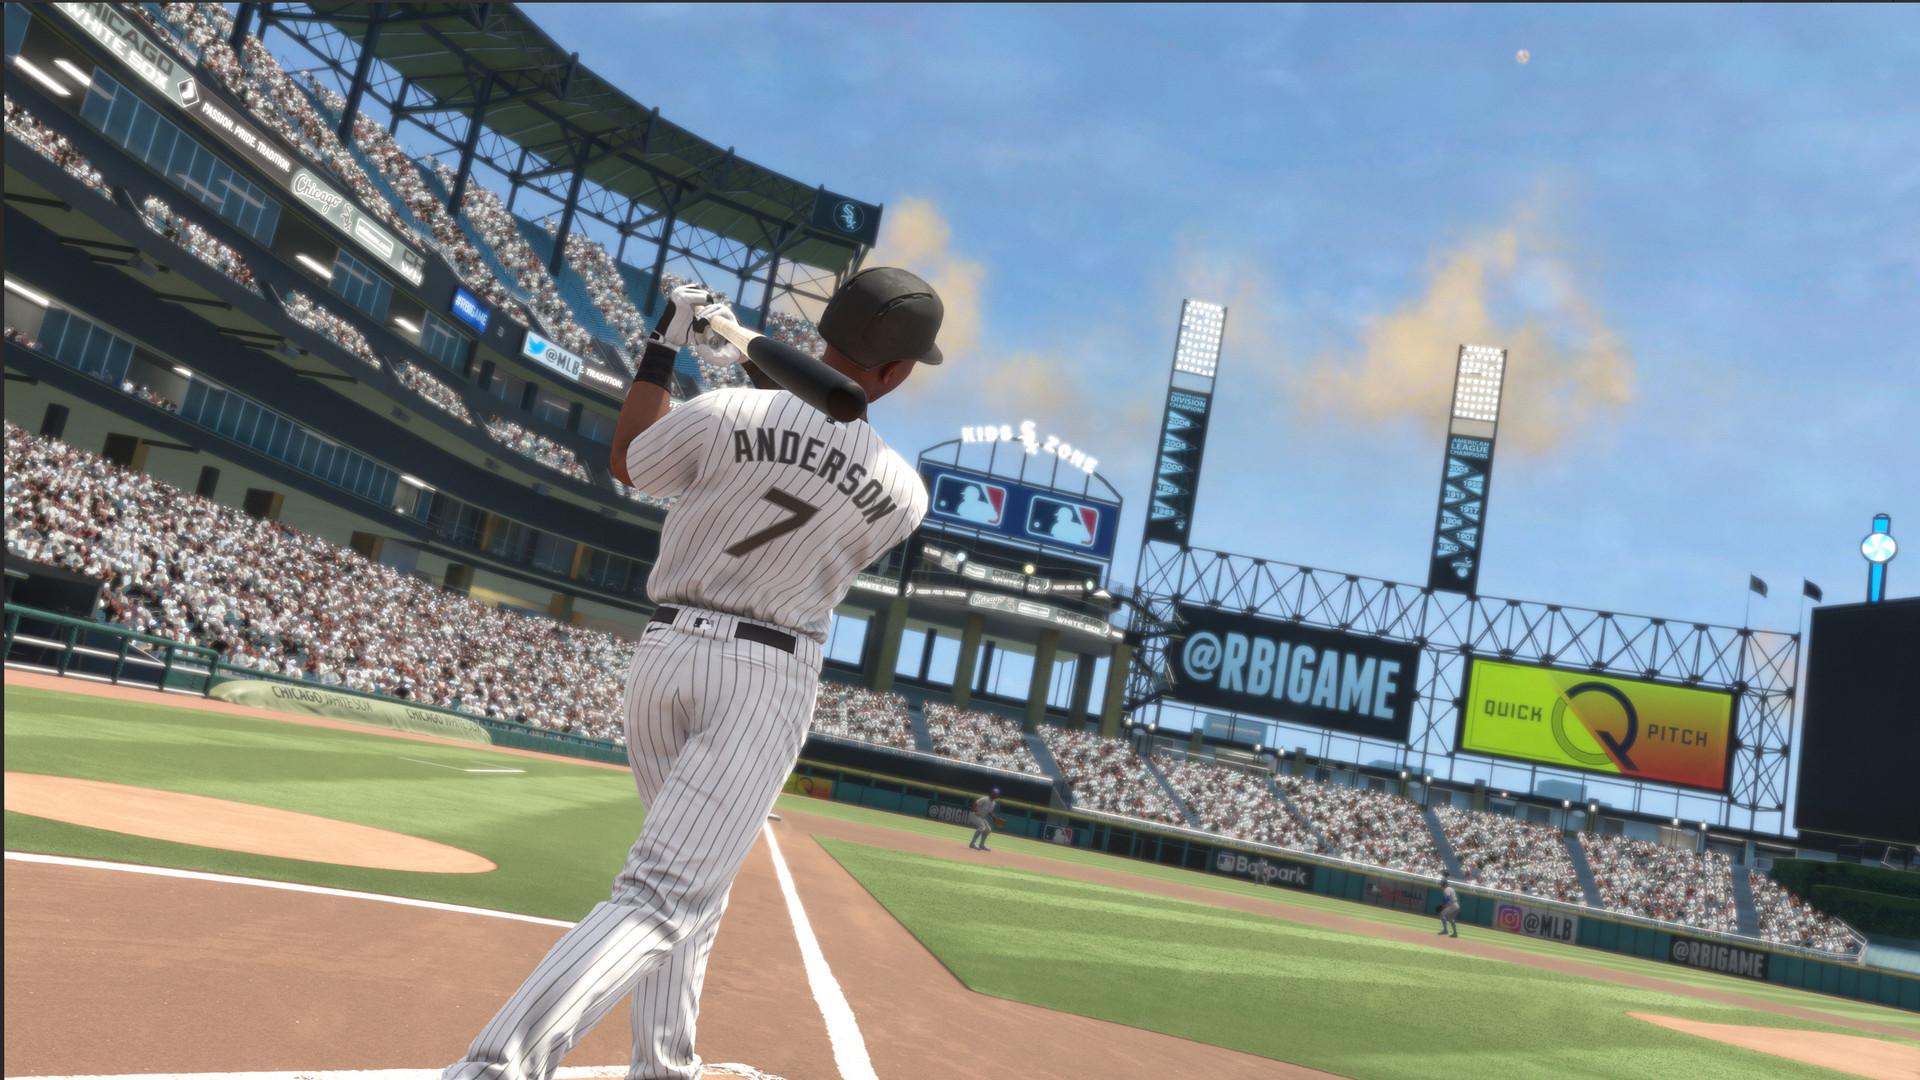 rbi-baseball-21-pc-screenshot-1